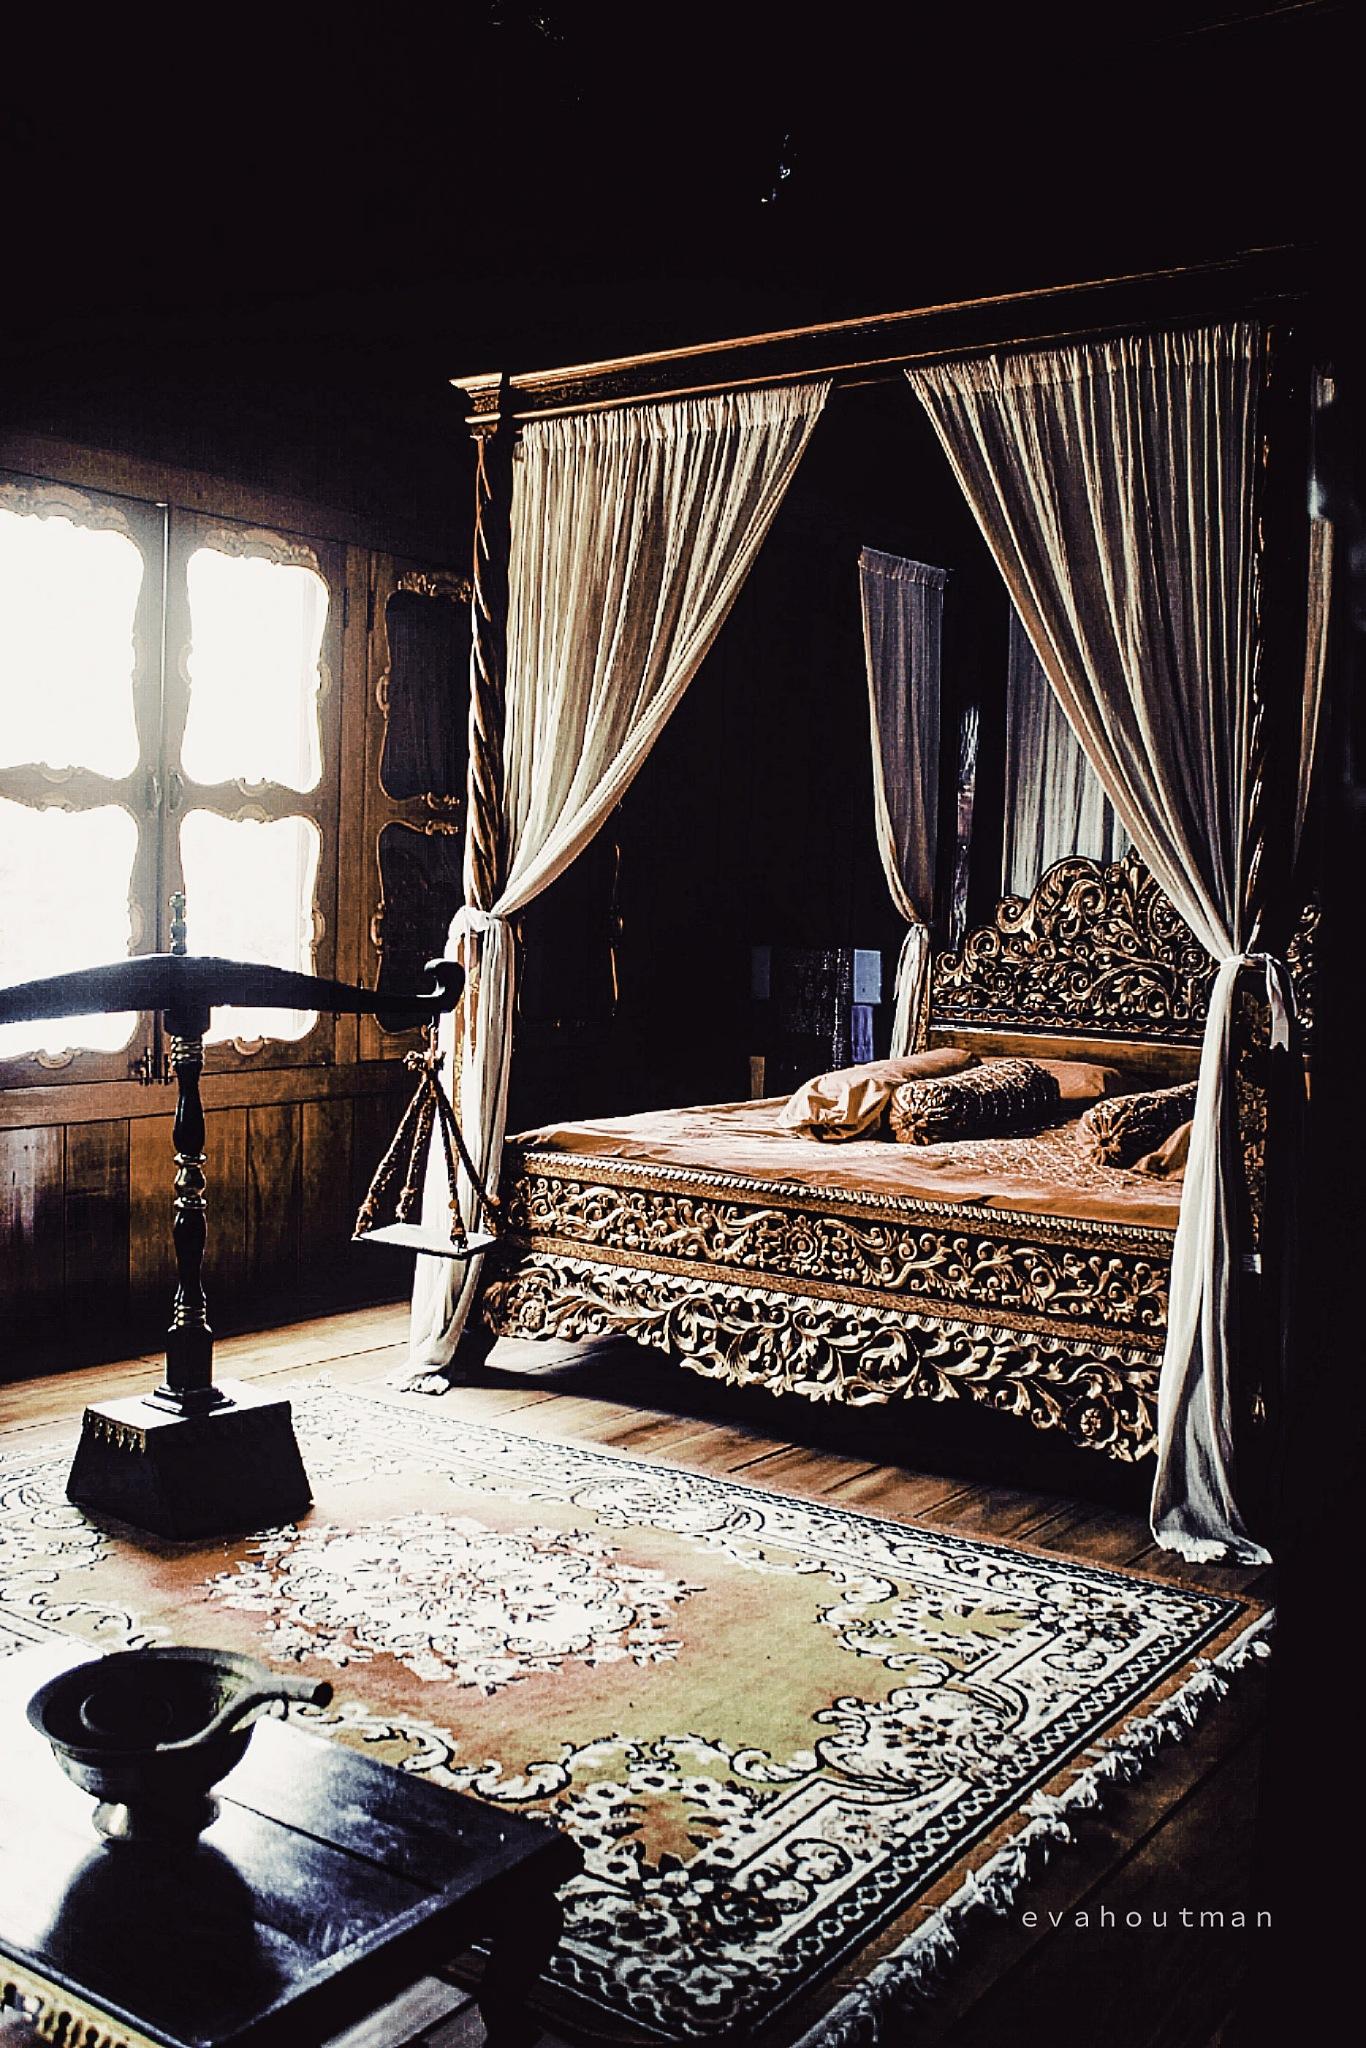 Photo in Random #evahoutman #peraduan #photography #mobileprints #classic #tradition #traditional #indoor #sumatera #melayu #indonesia #image #wallpaper #themes #lightroom #light #rug #no one #no person #window #room #bed #bedroom #ceritaeva #carve #golden carve #curtain